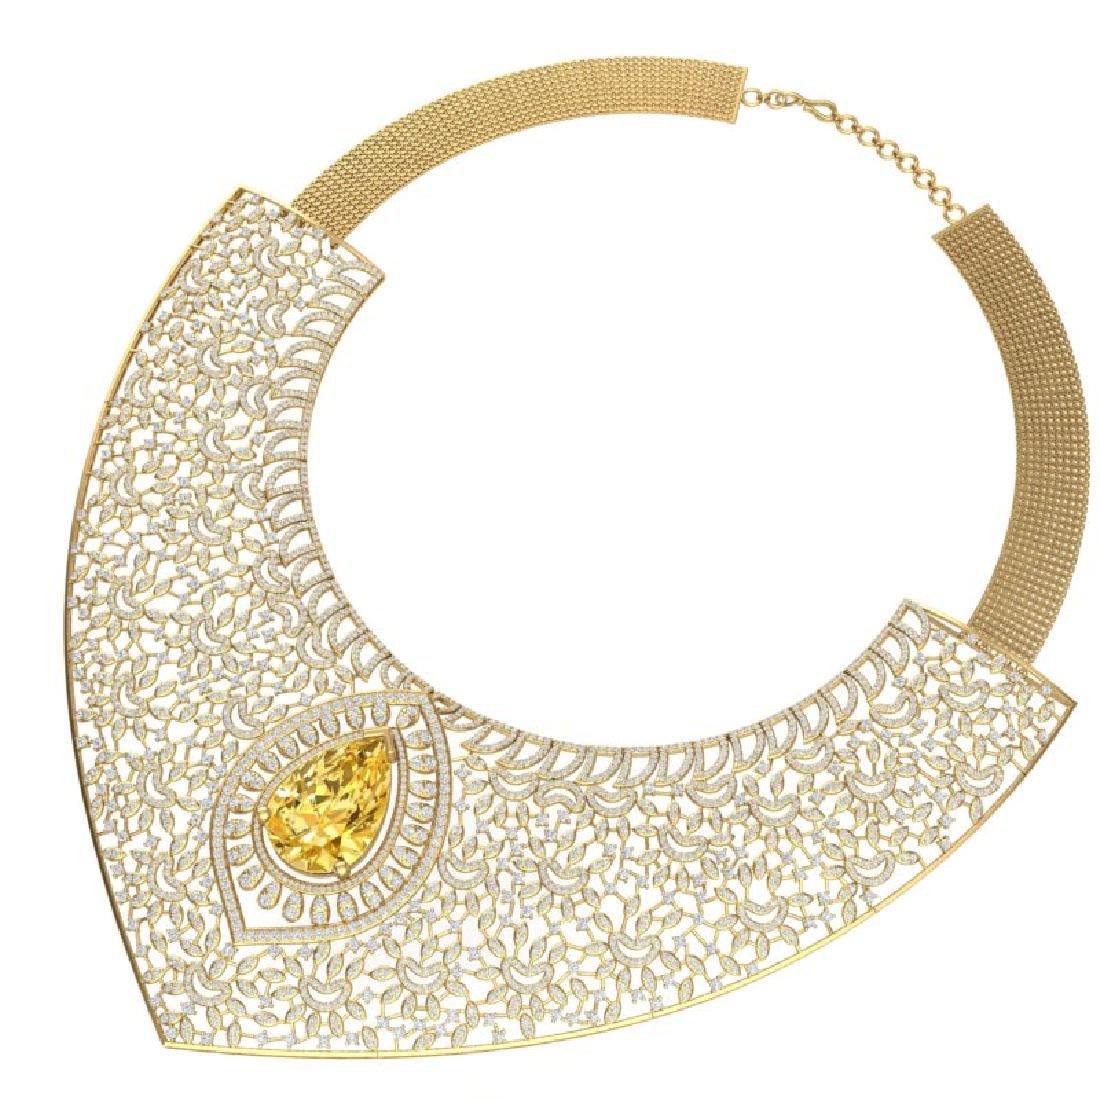 59.27 CTW Royalty Canary Citrine & VS Diamond Necklace - 3